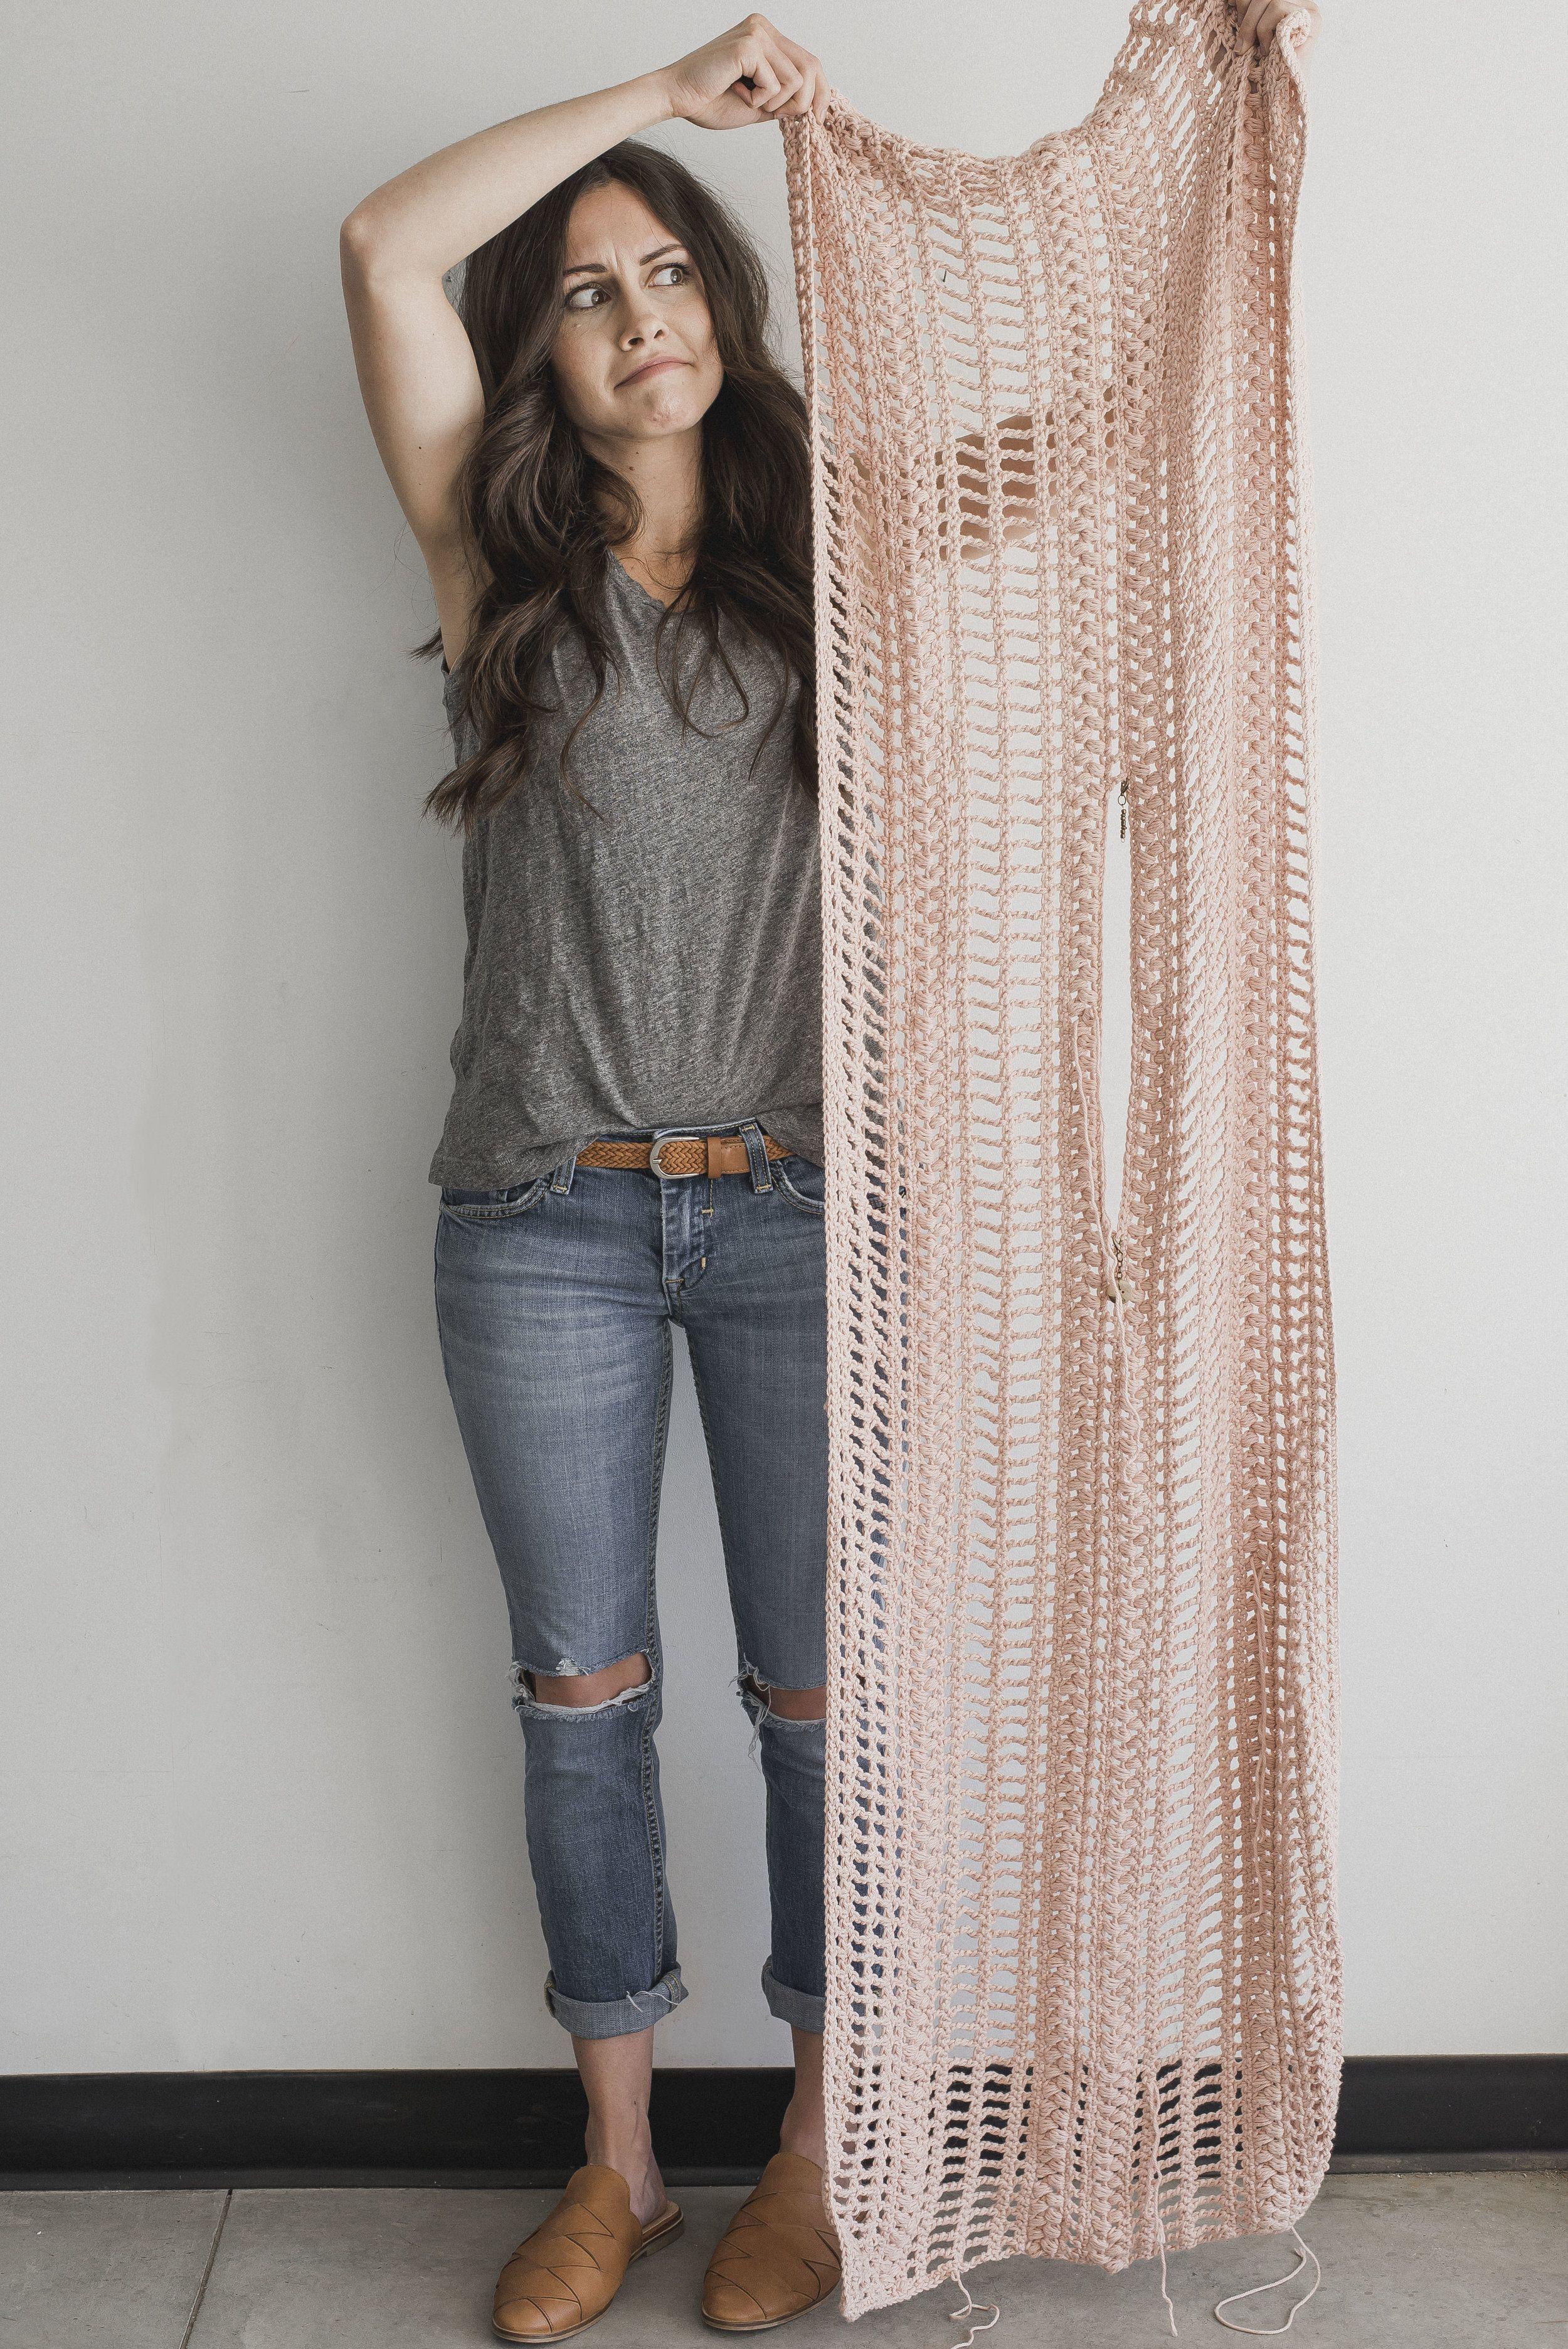 Free Crochet Pattern for the Easy, Breezy Swim Cover